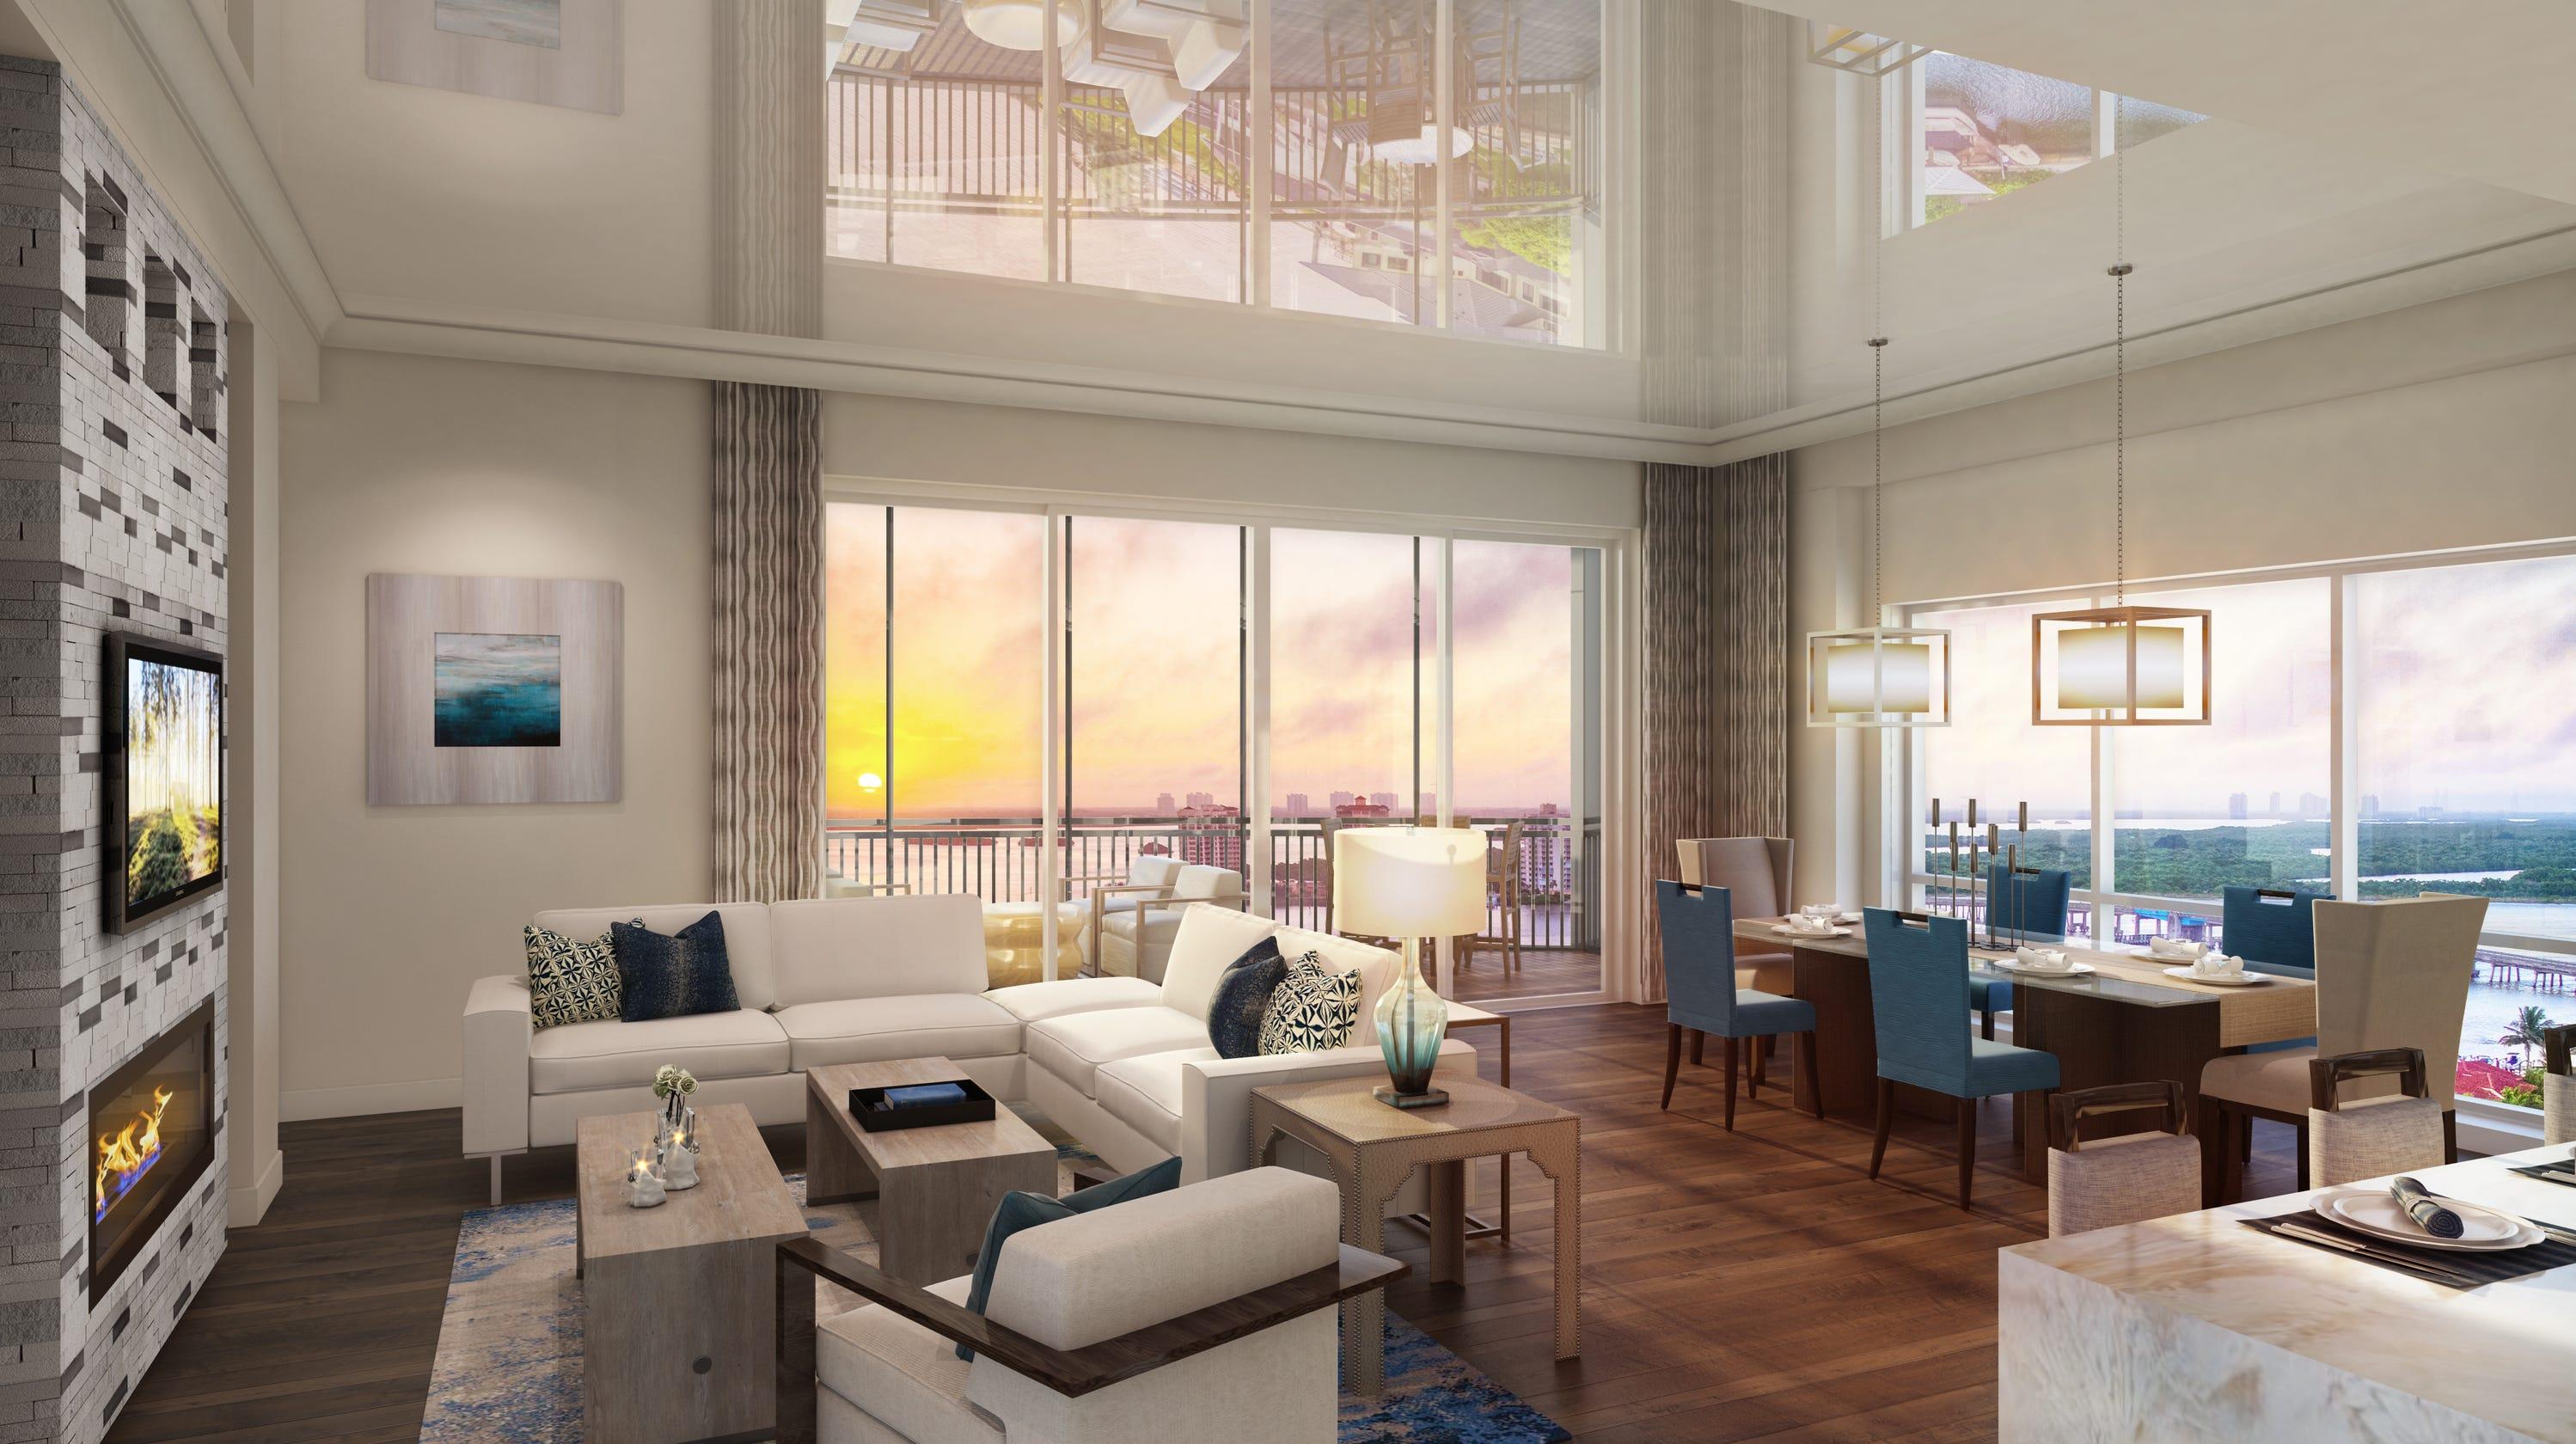 Spacious Floor Plans Coastal Lifestyle Featured At Grandview